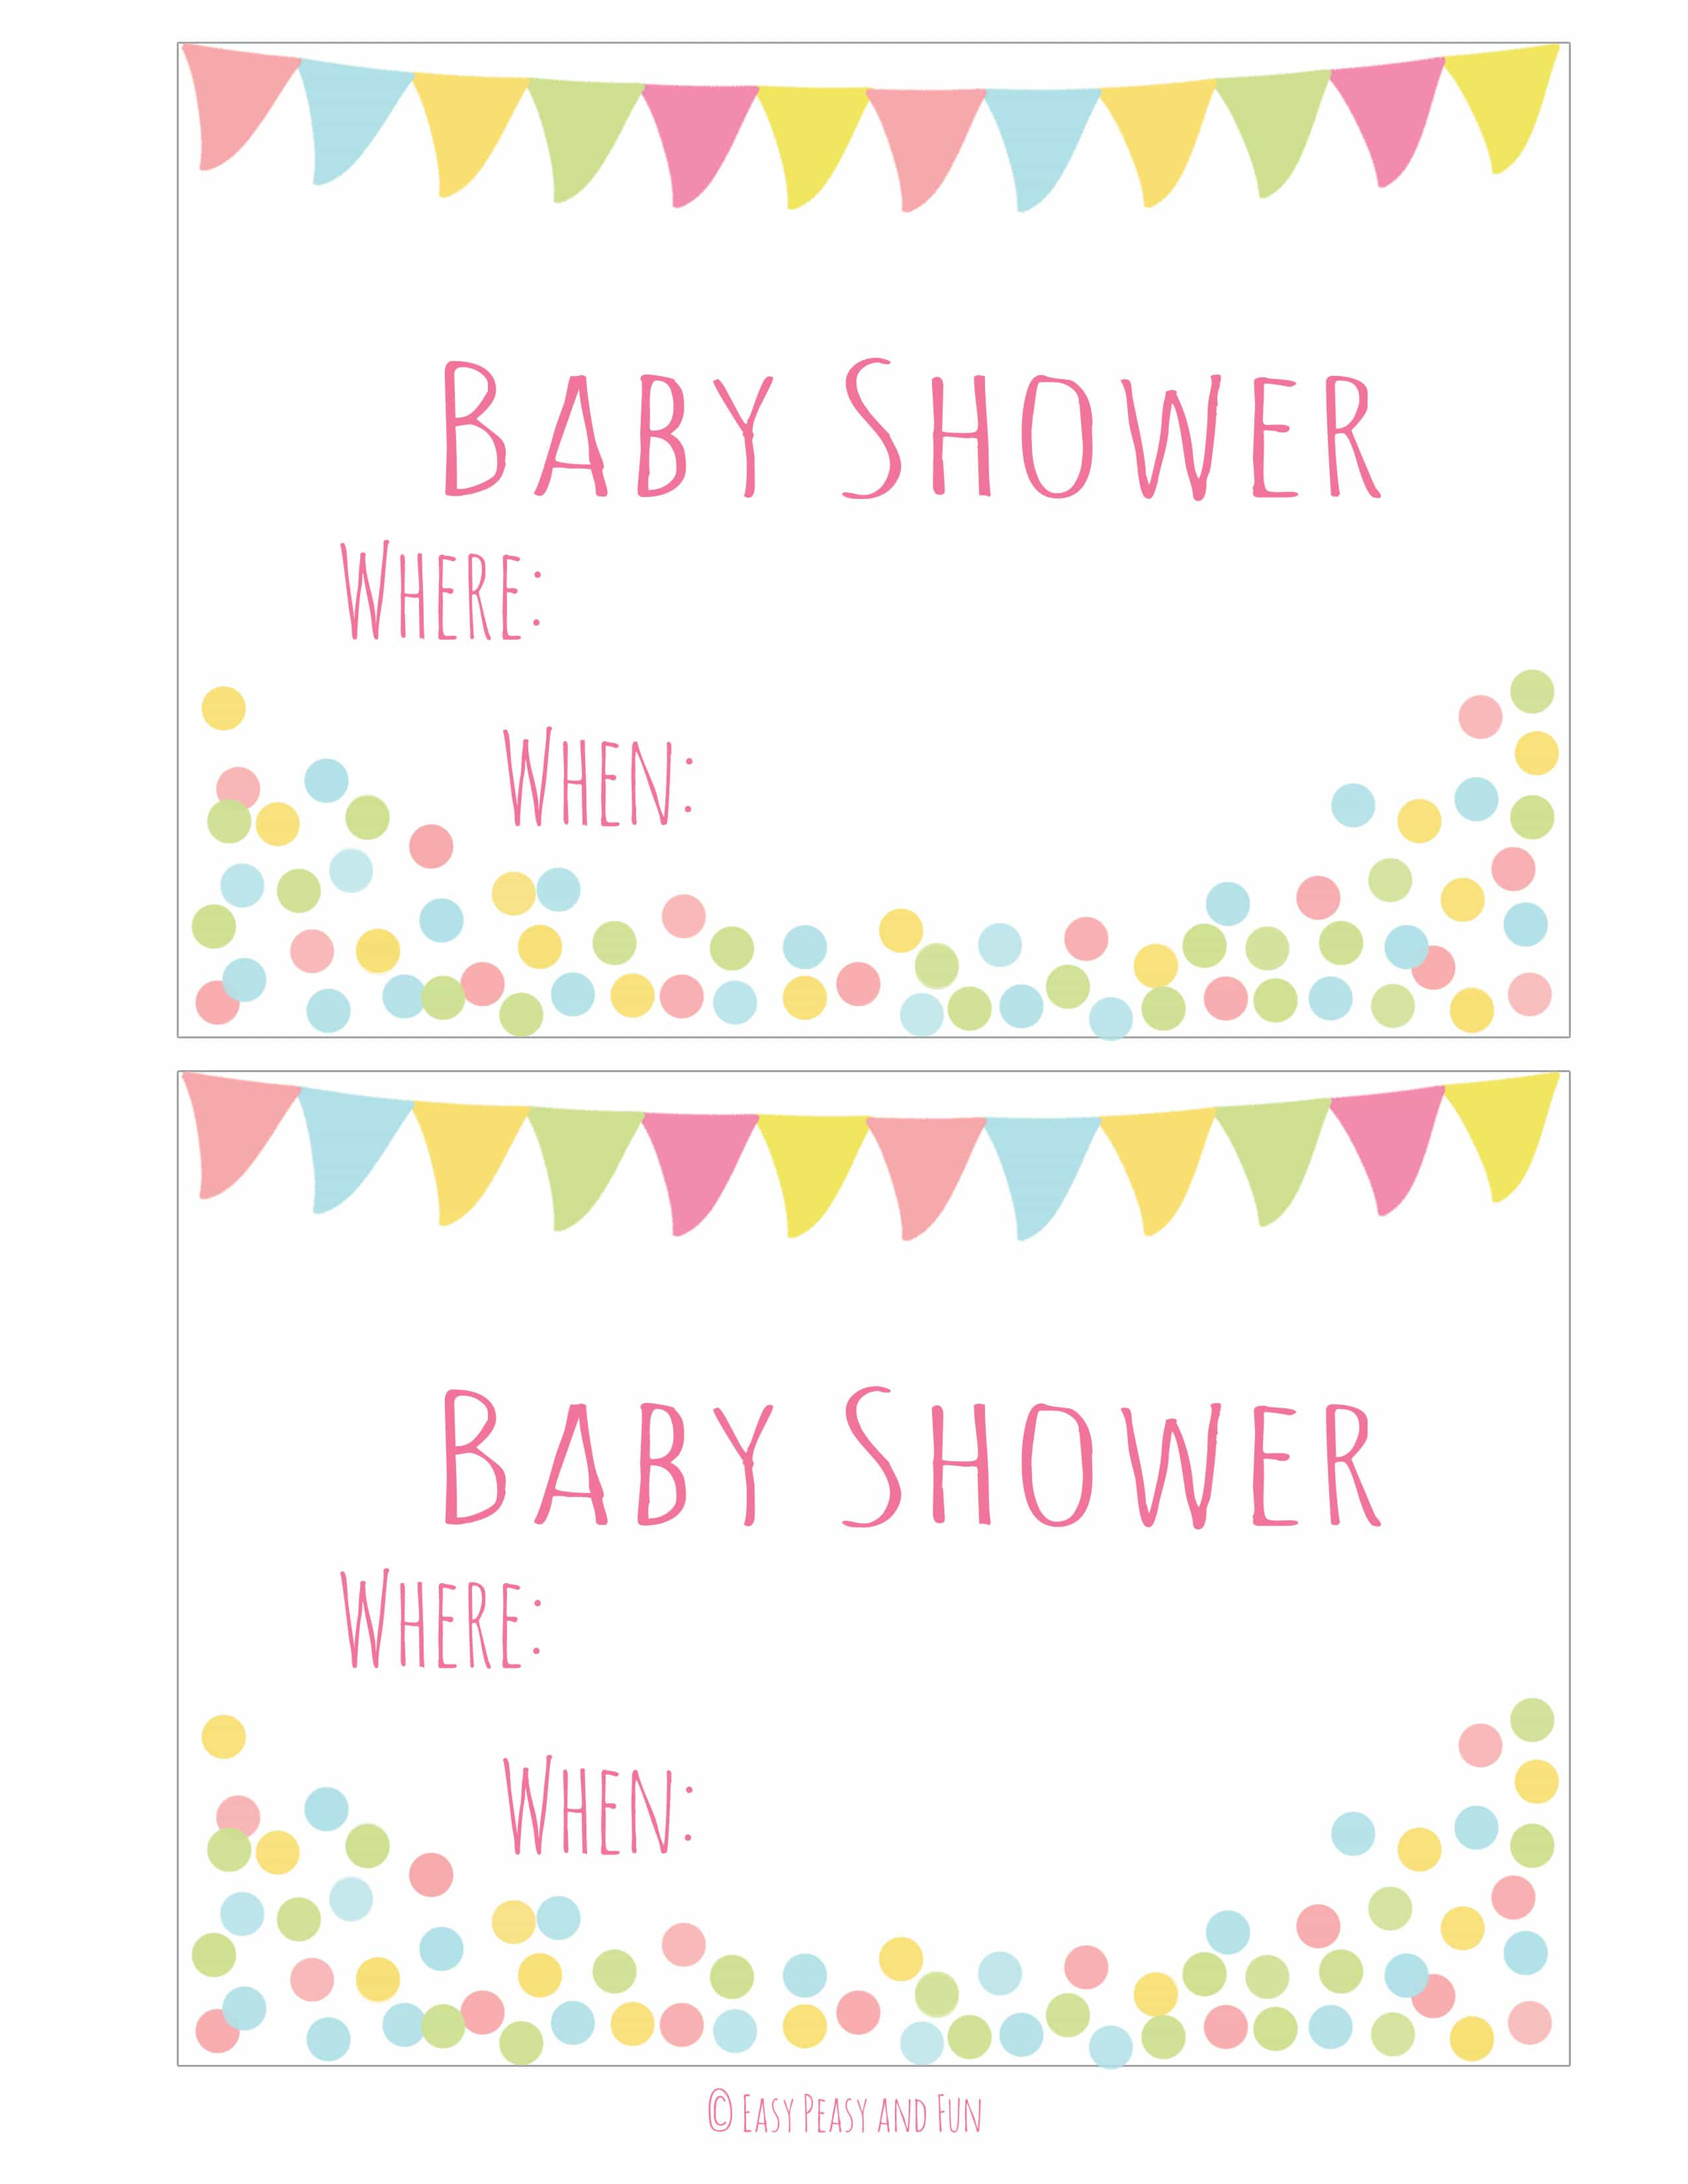 Free Printable Baby Shower Invitation - Easy Peasy And Fun - Baby Shower Templates Free Printable